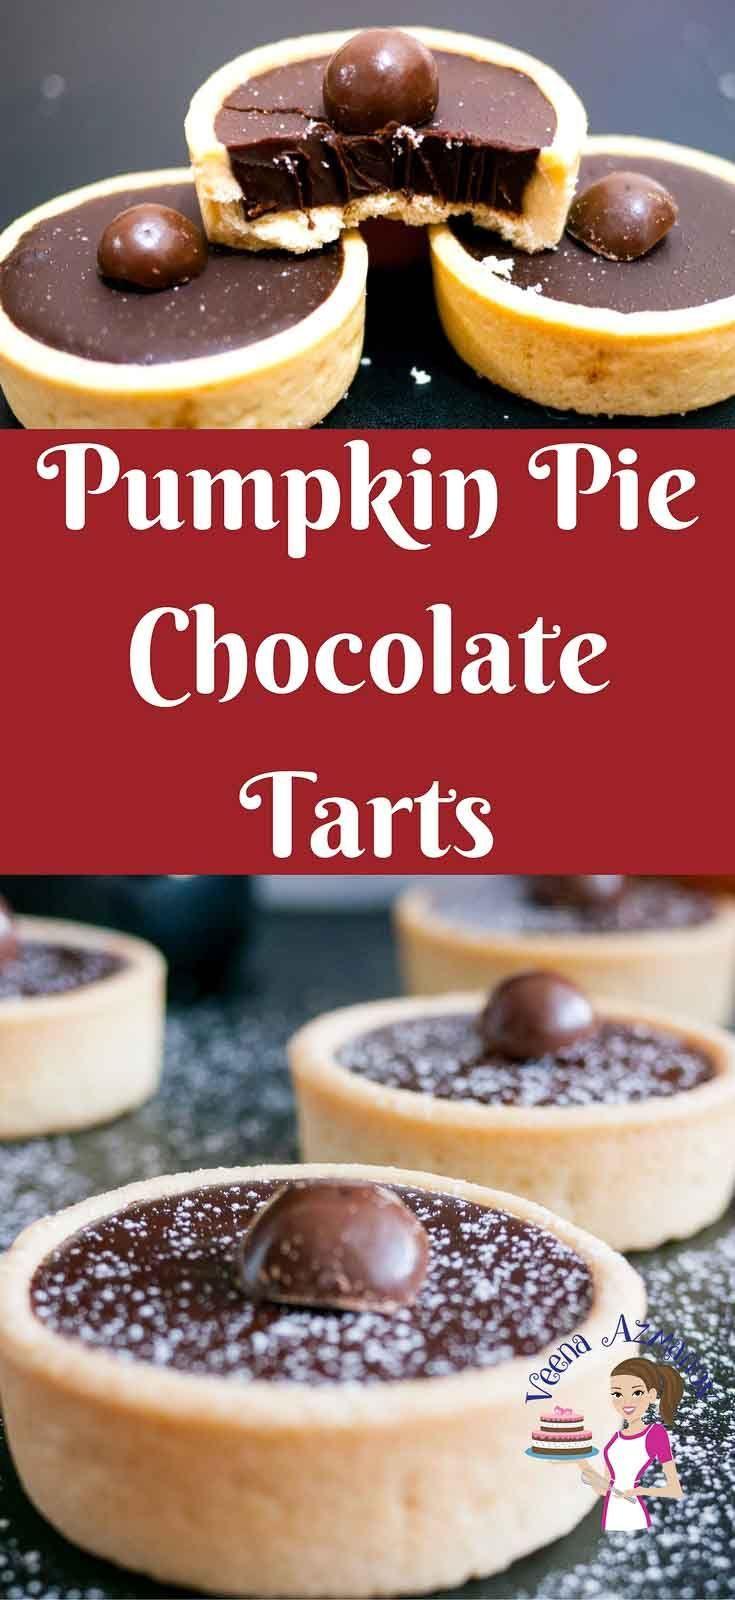 Pumpkin Pie Chocolate Tarts Recipe - Perfect Thanksgiving Dessert